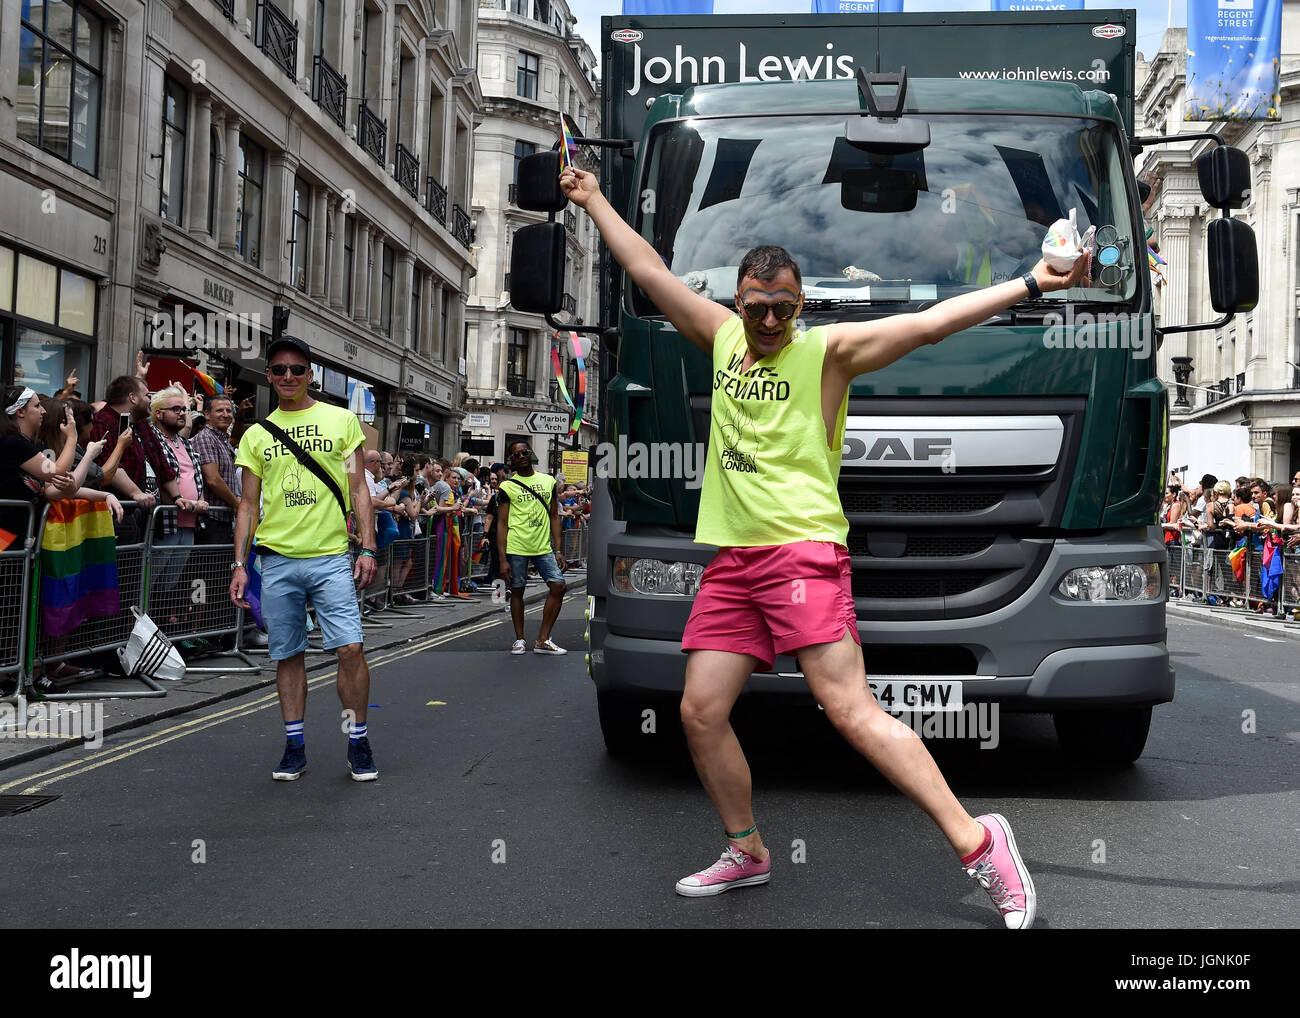 London, UK. 08th July, 2017. A wheel Steward danced during Pride In London on Saturday. Photo : Taka G Wu Credit: - Stock Image